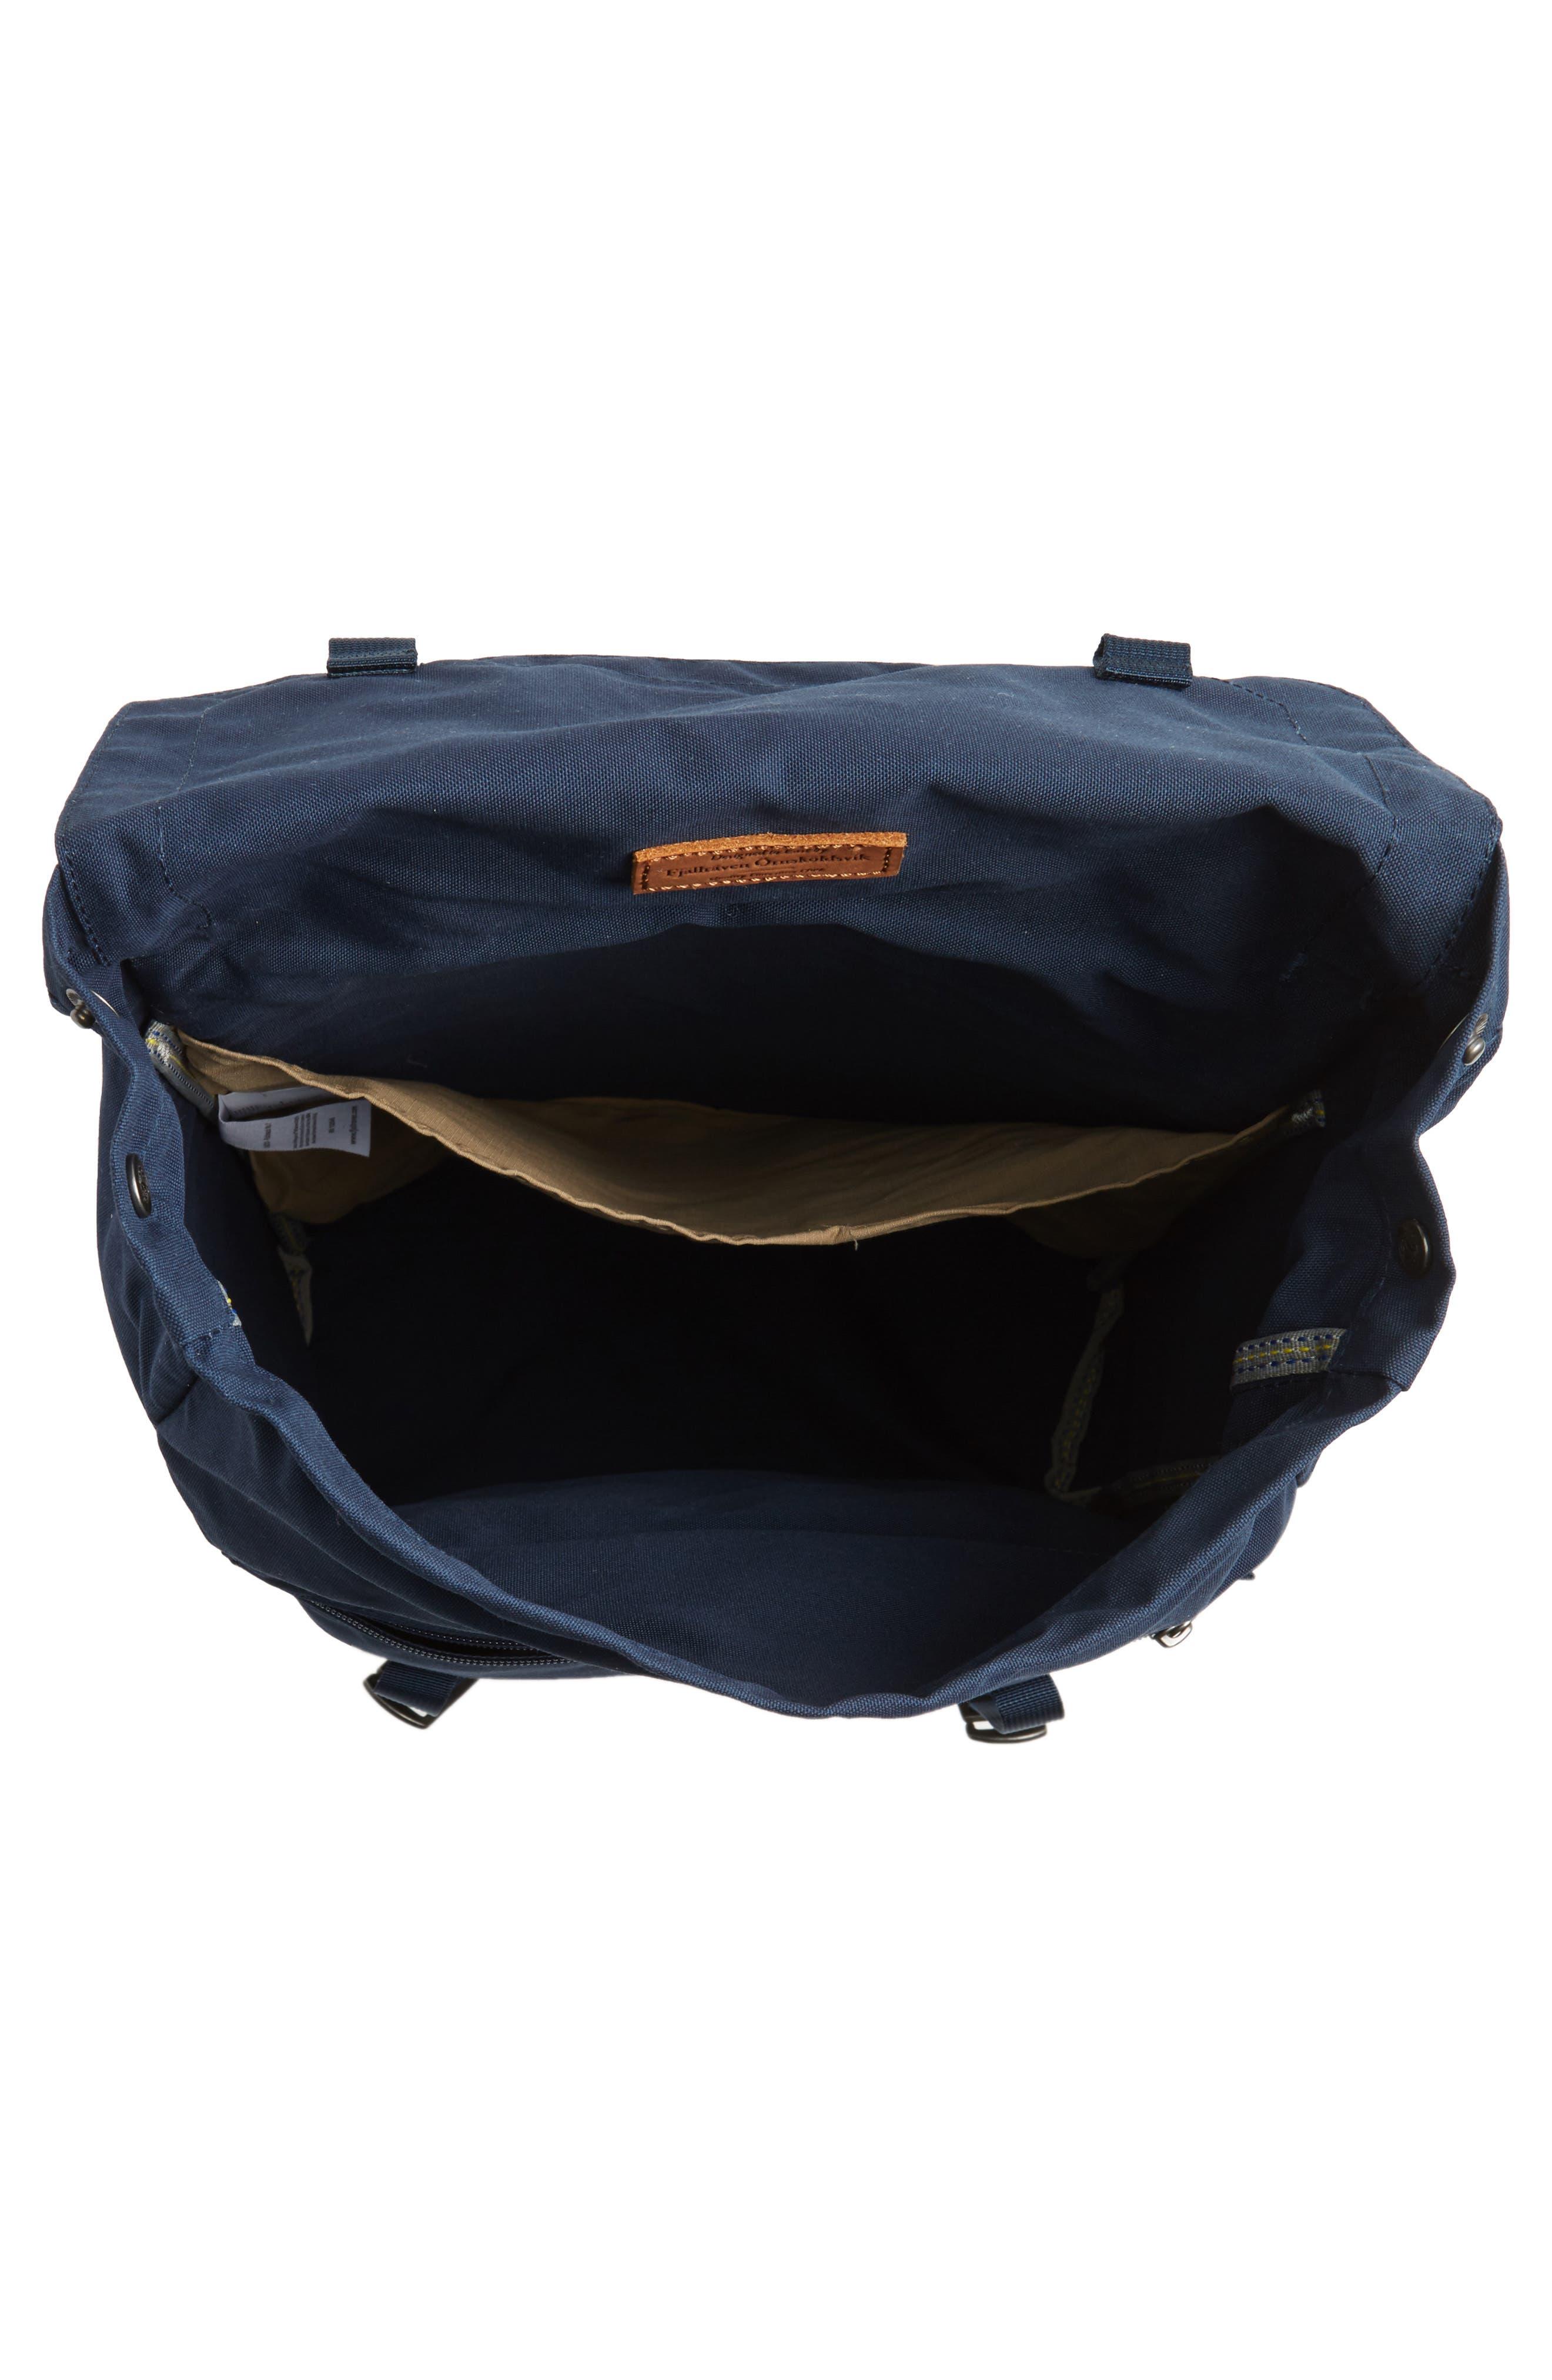 Foldsack No.1 Water Resistant Backpack,                             Alternate thumbnail 4, color,                             Navy